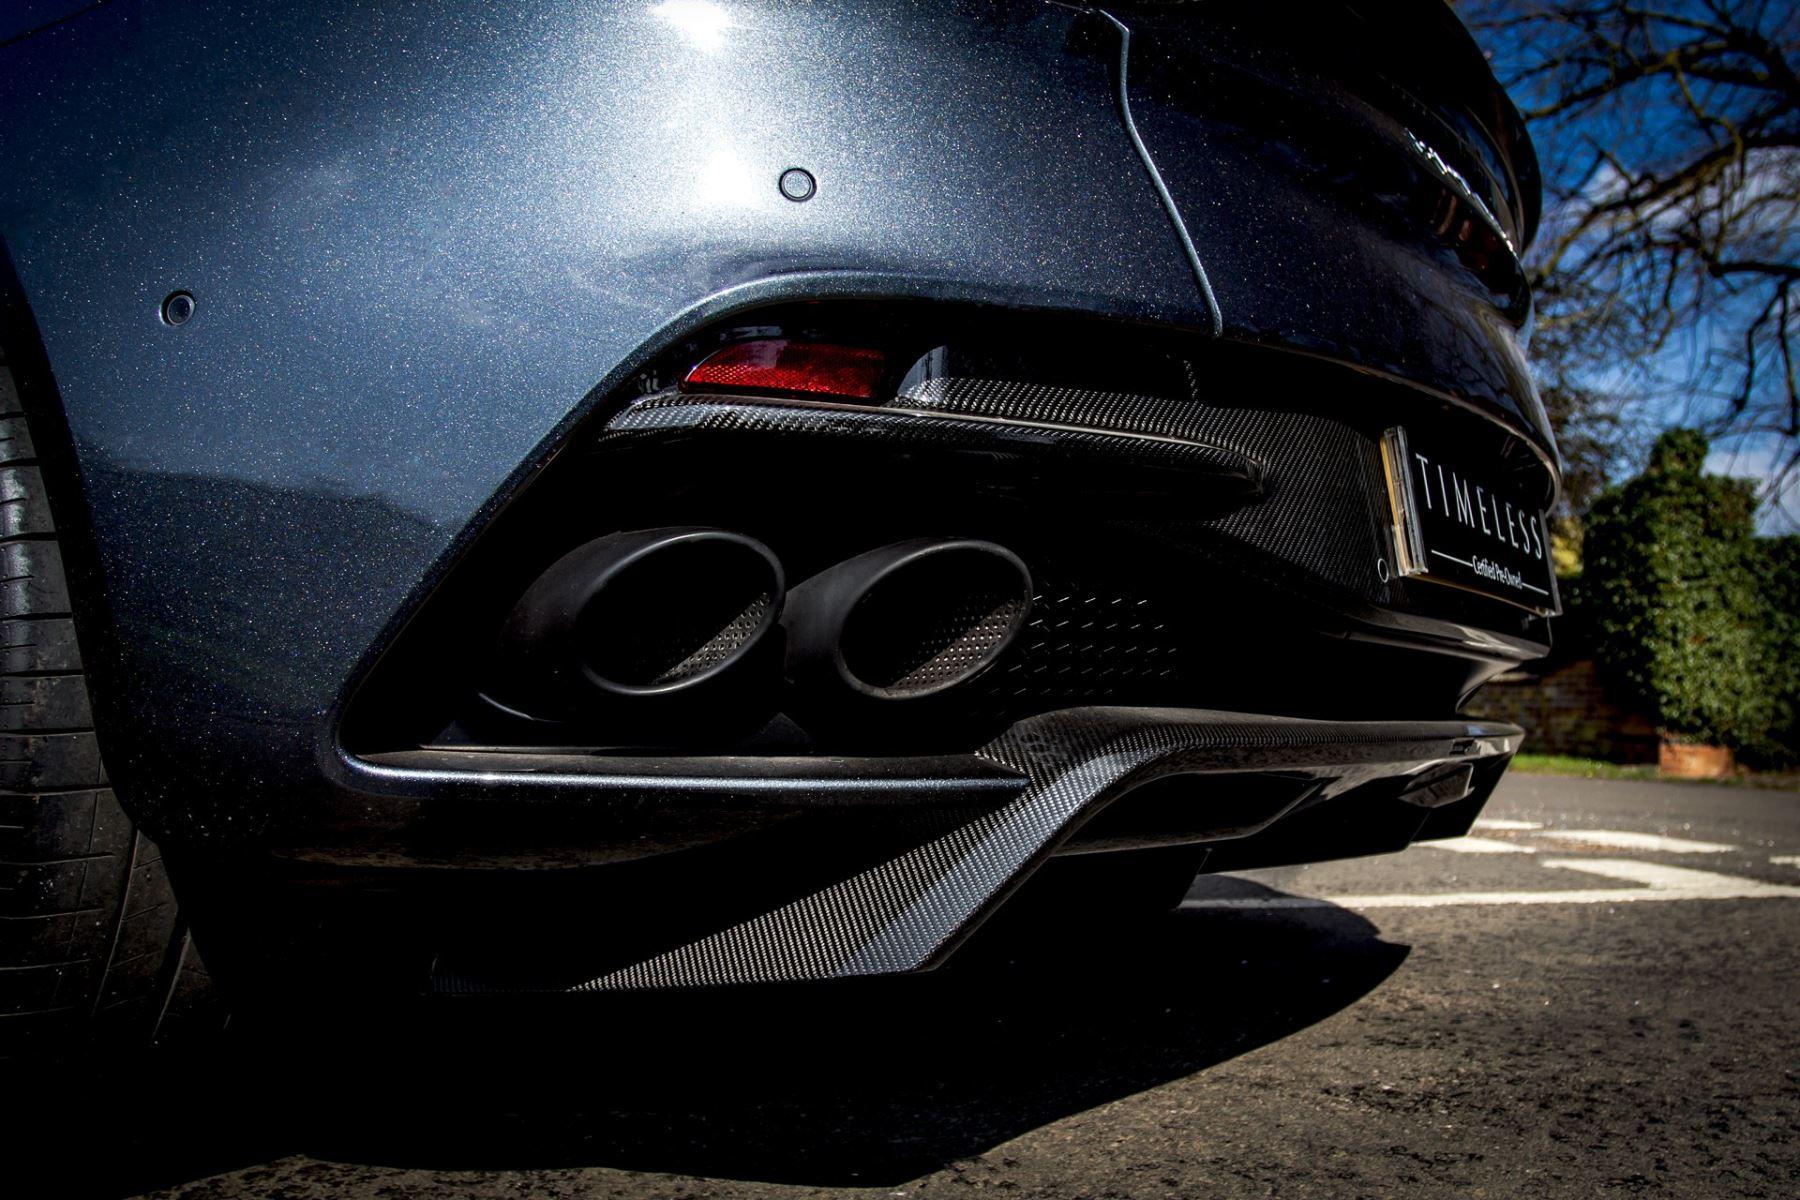 Aston Martin DBS V12 Superleggera 2dr Touchtronic image 6